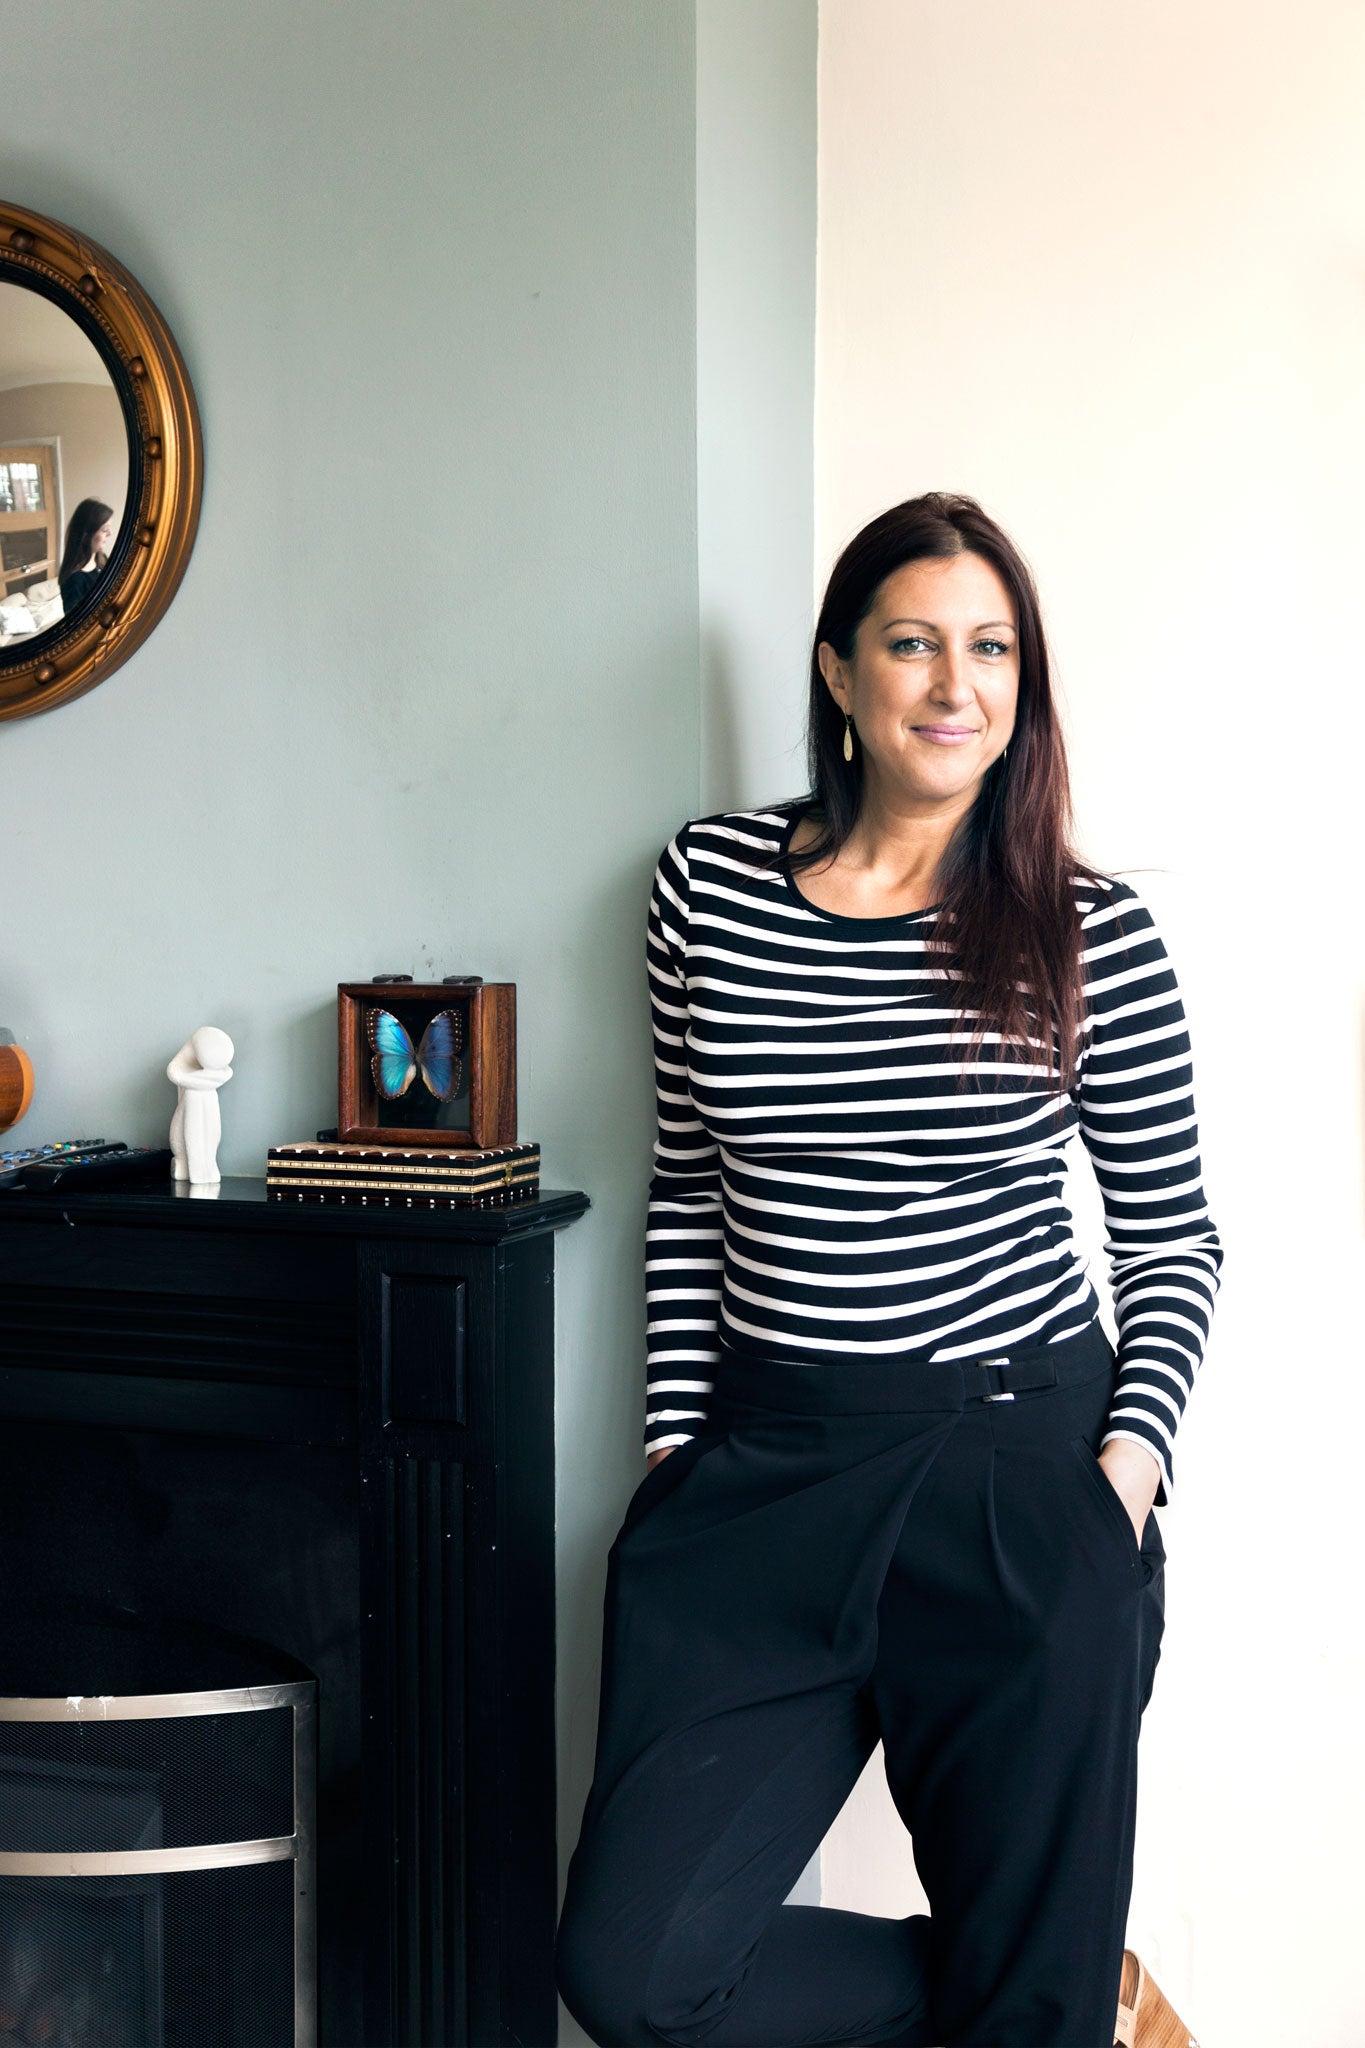 Samantha Janus (born 1972),Leah Purcell Adult pic Penelope Windust,Mallika Sherawat